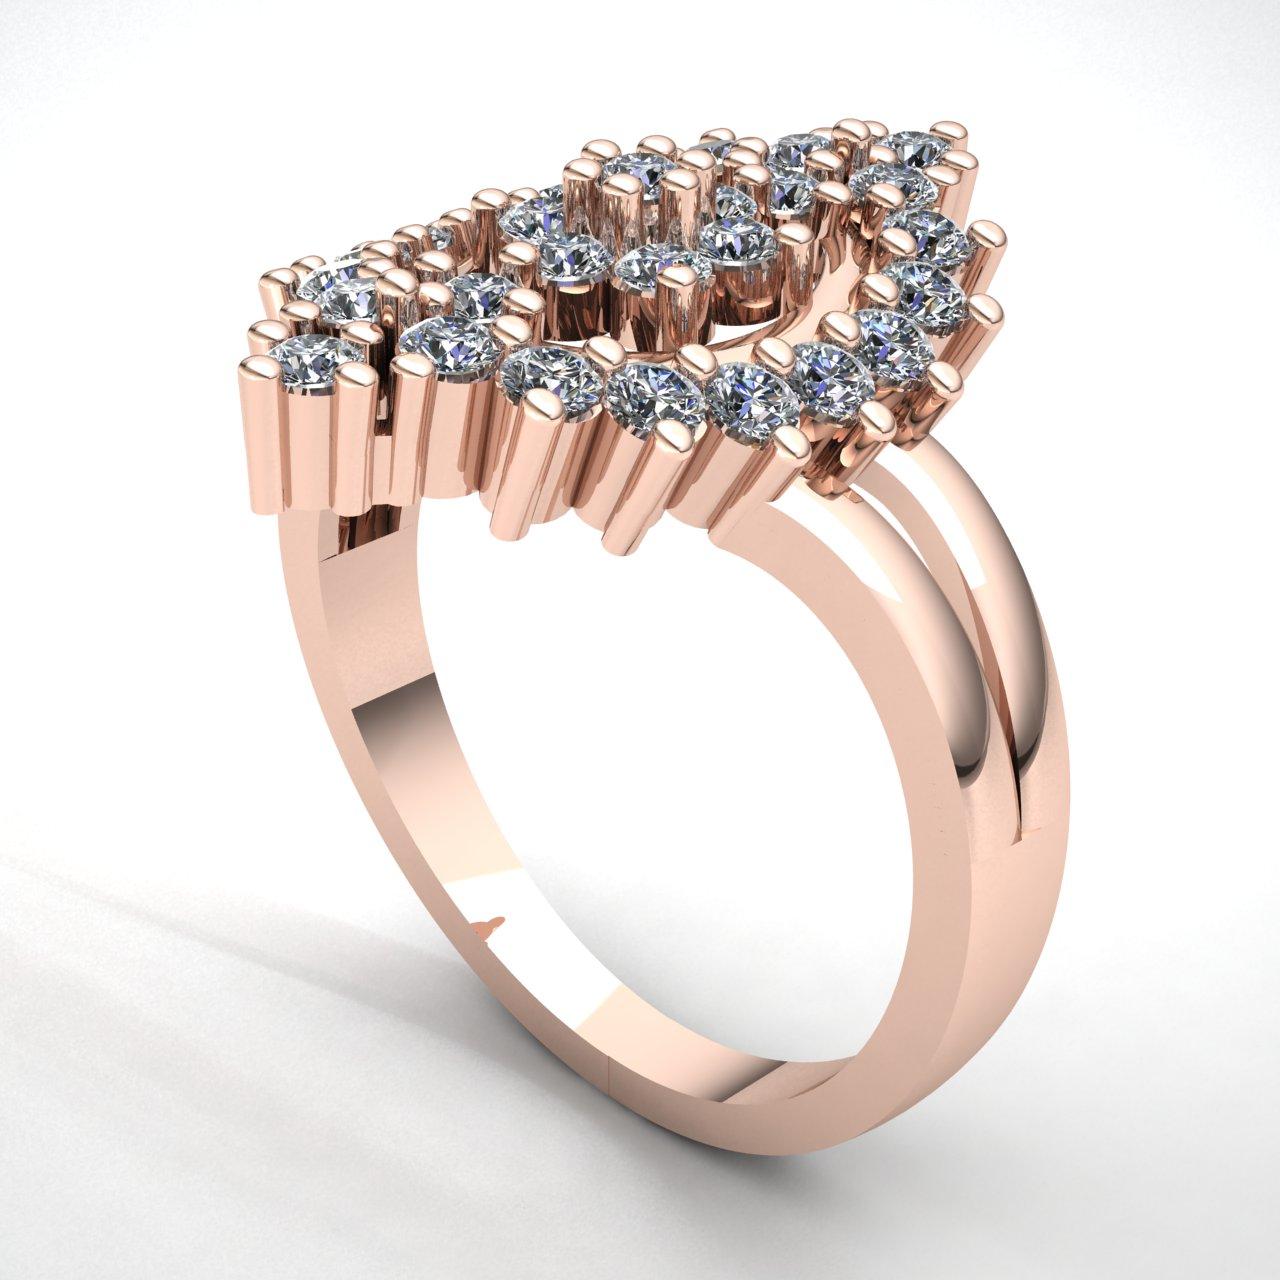 1-Quilate-Diamante-Brillante-Redondo-Mujer-Novia-Flor-Halo-Anillo-de-Compromiso miniatura 7